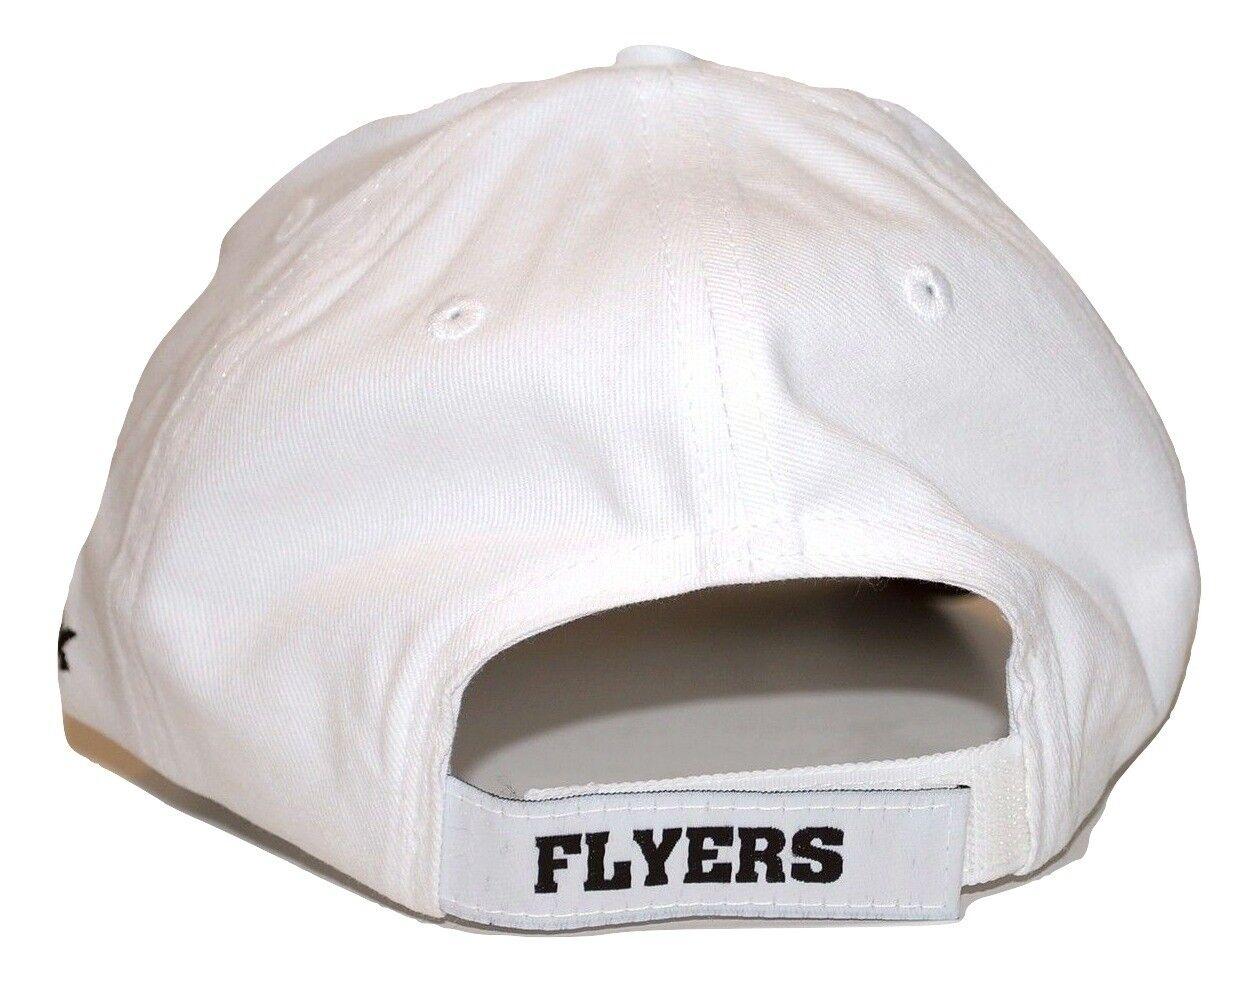 new style d07aa 17fc6 ... ireland philadelphia flyers reebok hockey nhl slash team logo  adjustable hockey reebok cap hat 2bf81c 86459